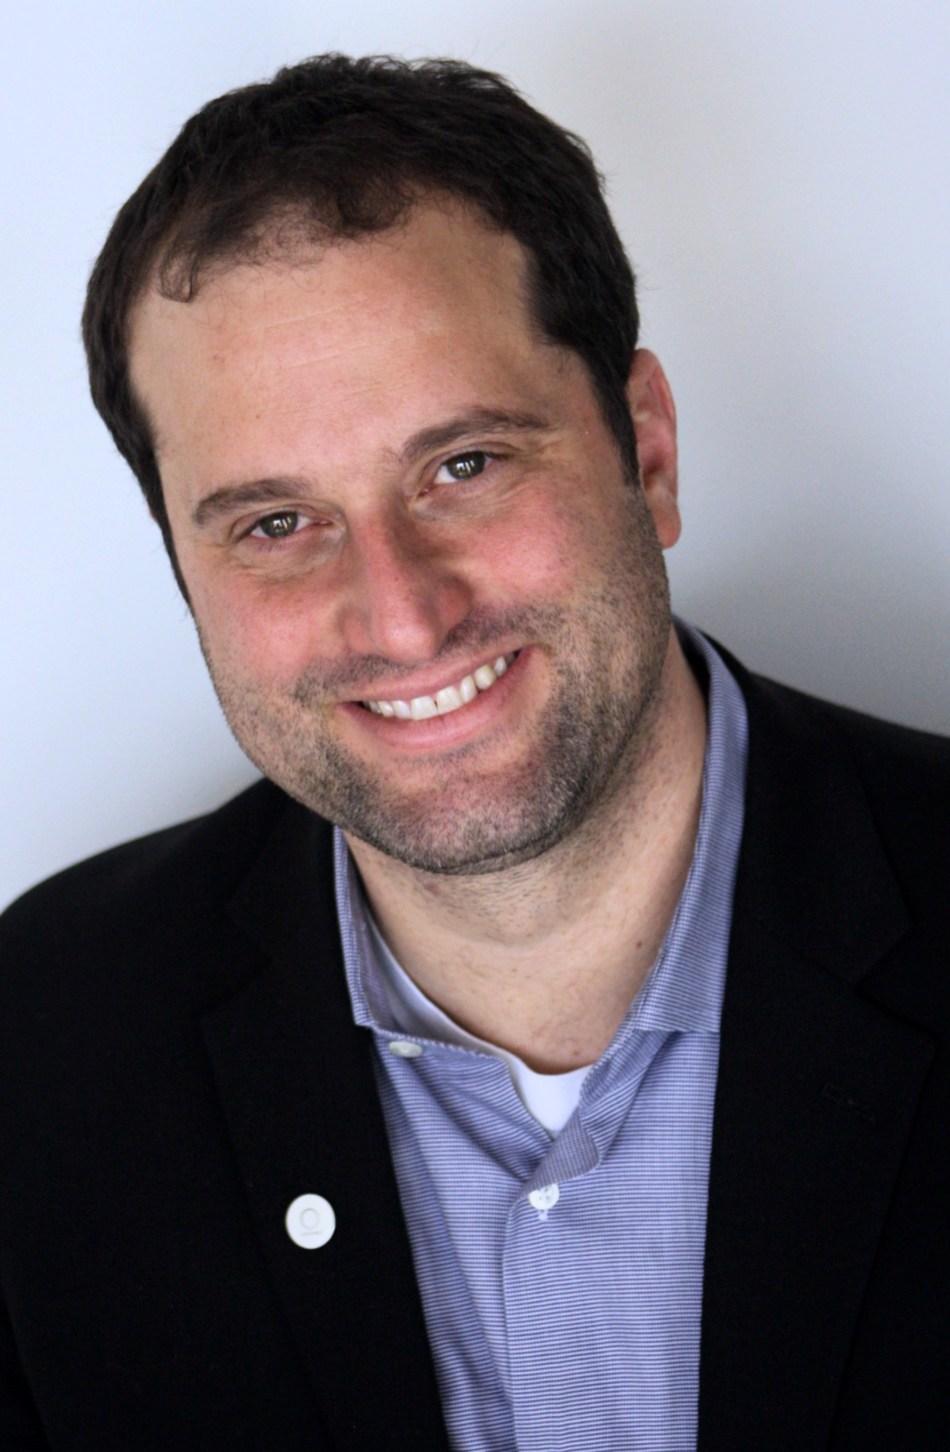 Blake Richetta, Chairman and CEO of sonnen, Inc.